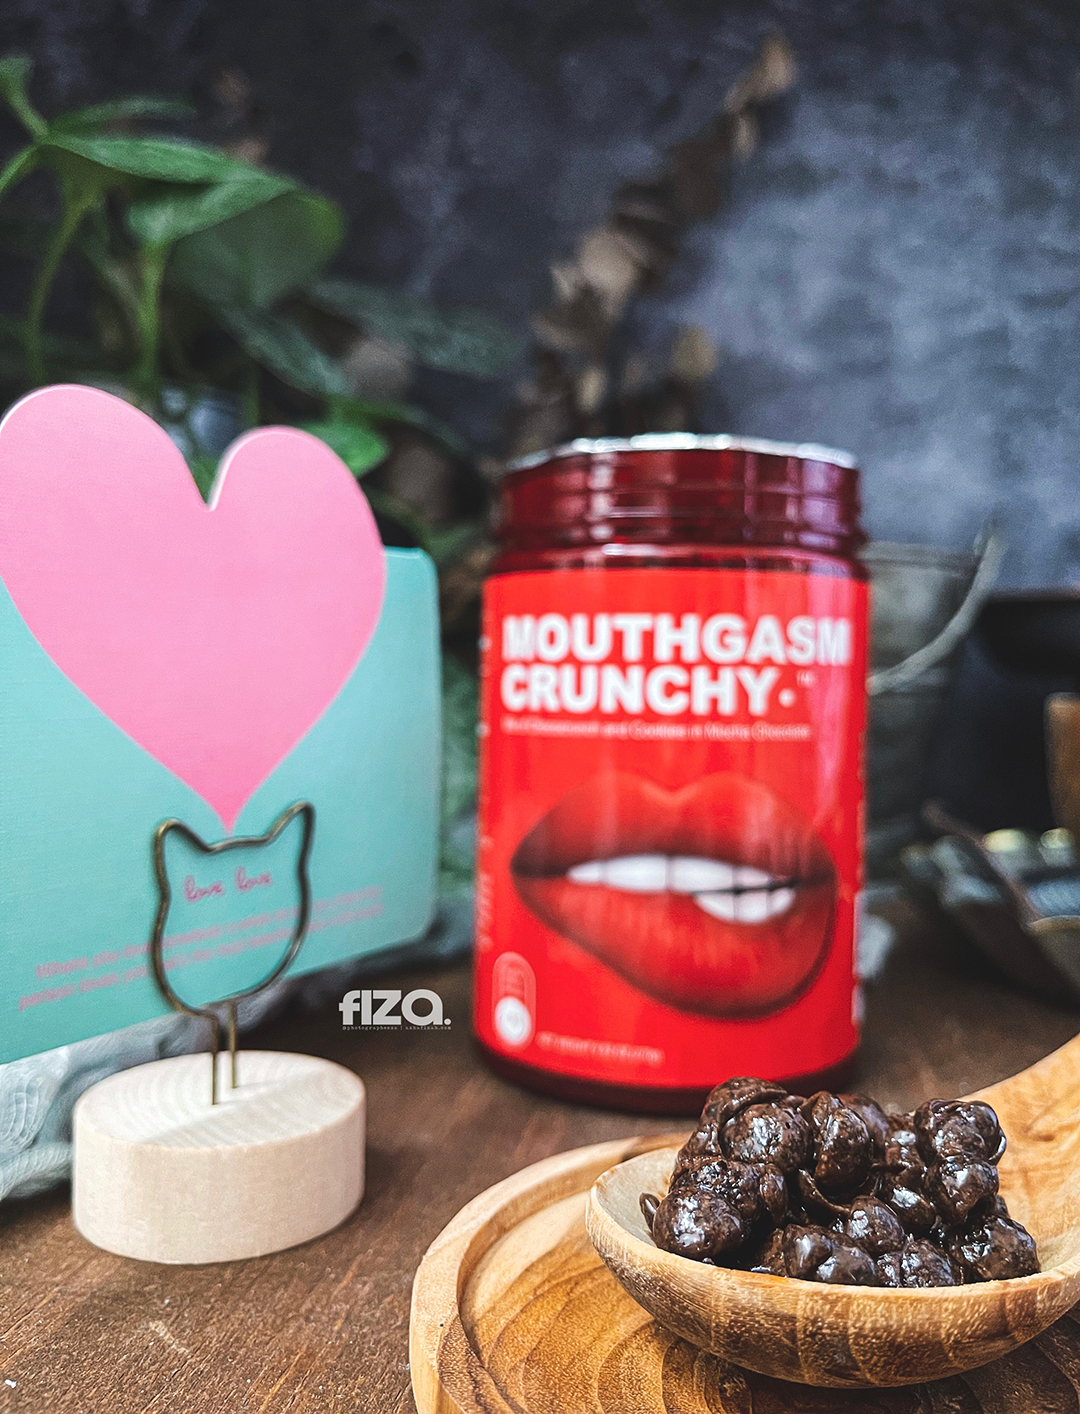 Mouthgasm Crunchy Close Up